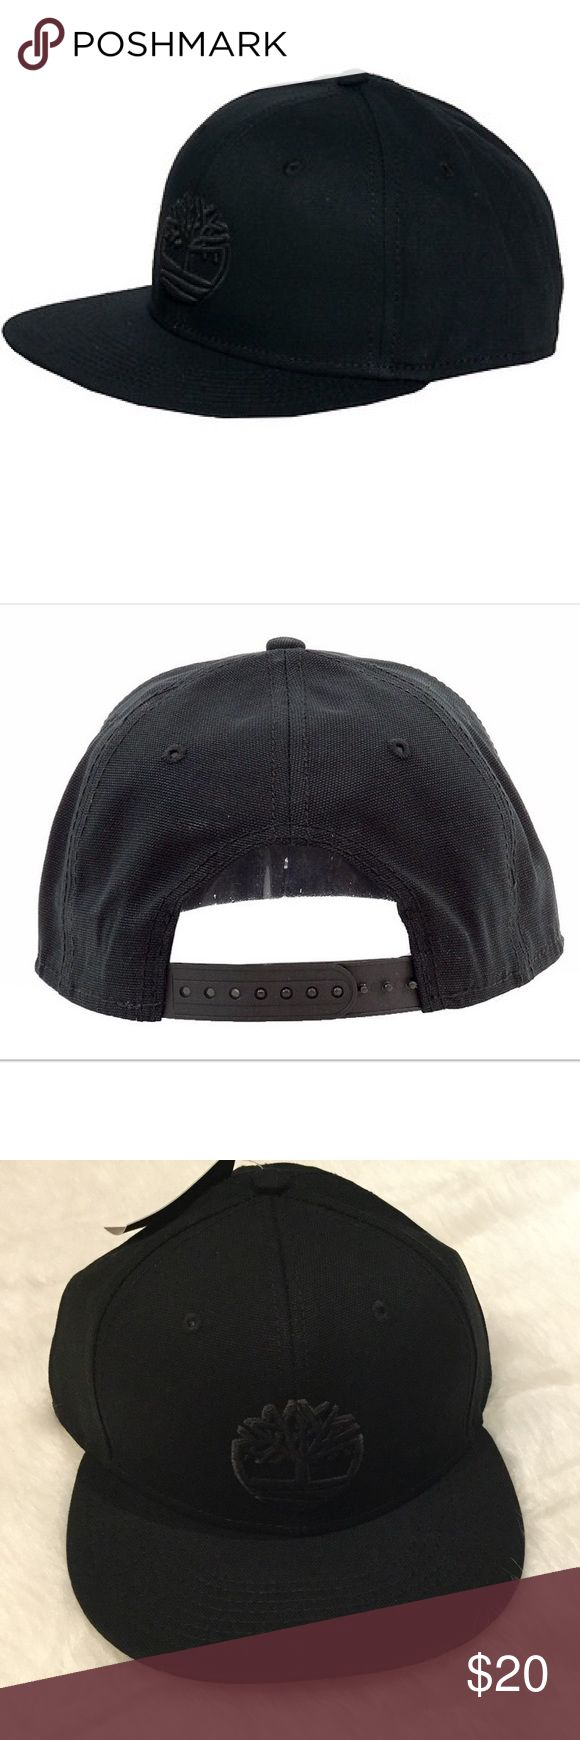 "NWT Timberland Raised Logo Snapback Raised logo embroidery at front, flat brim.  Adjustable snapback closure.  Sweatband at reverse.2 7/8"" brim.  100% cotton.  Color: Black. Timberland Accessories Hats"